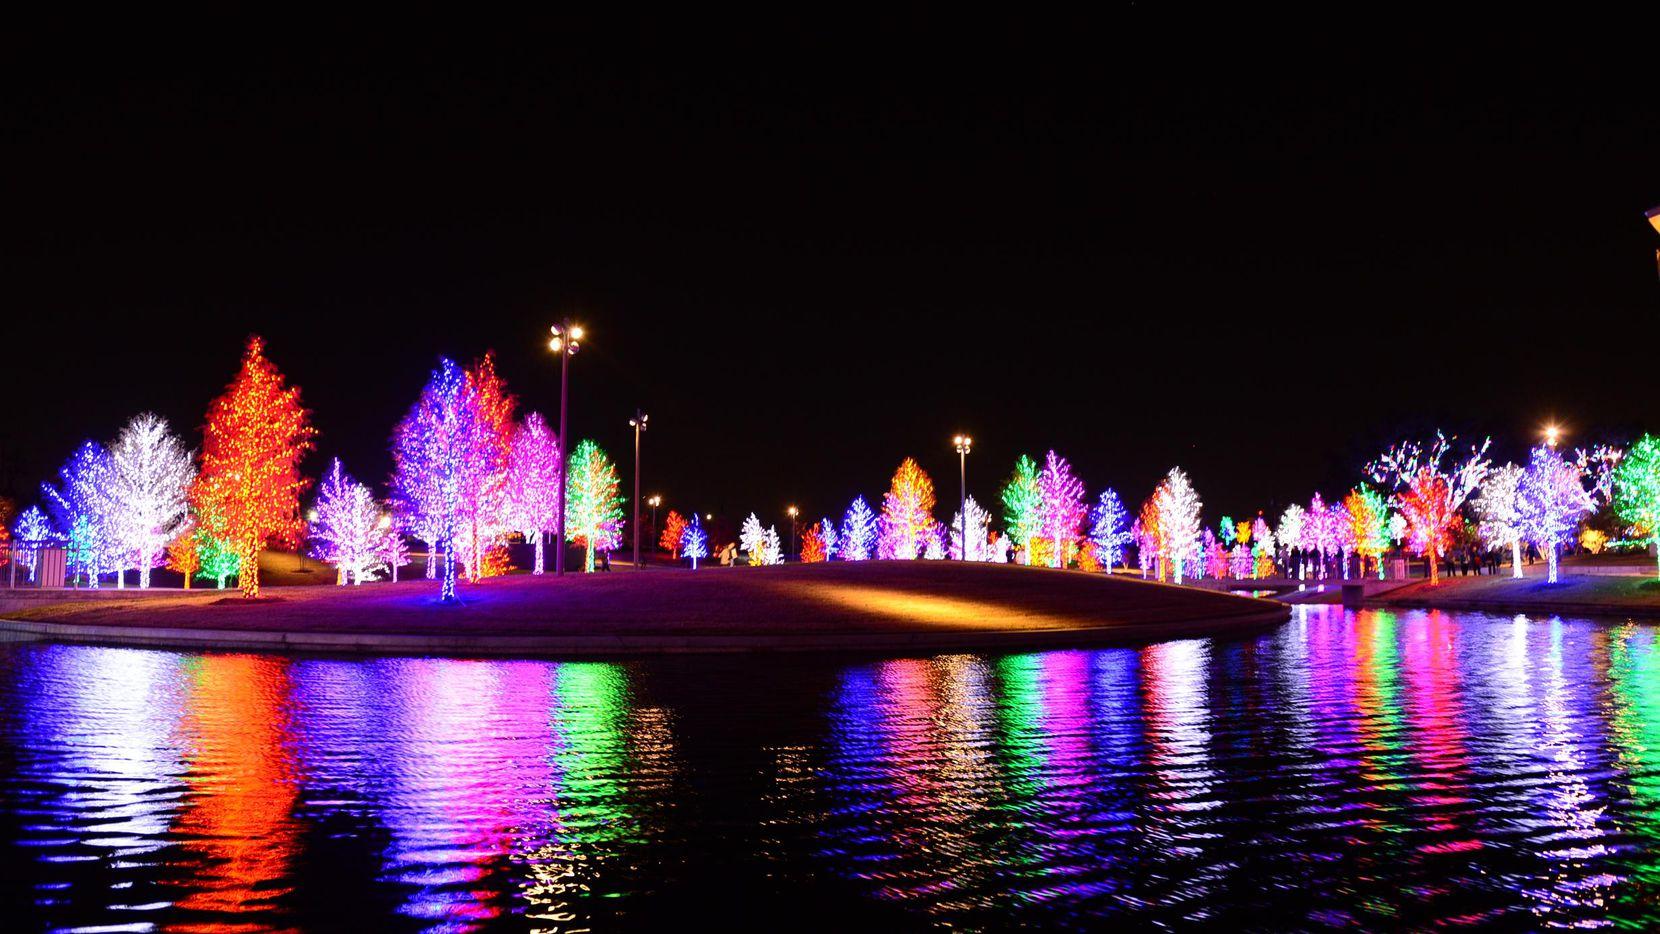 Vitruvian Lights continúan su encanto en Addison hasta el 1 de enero.(Stevan Koye)